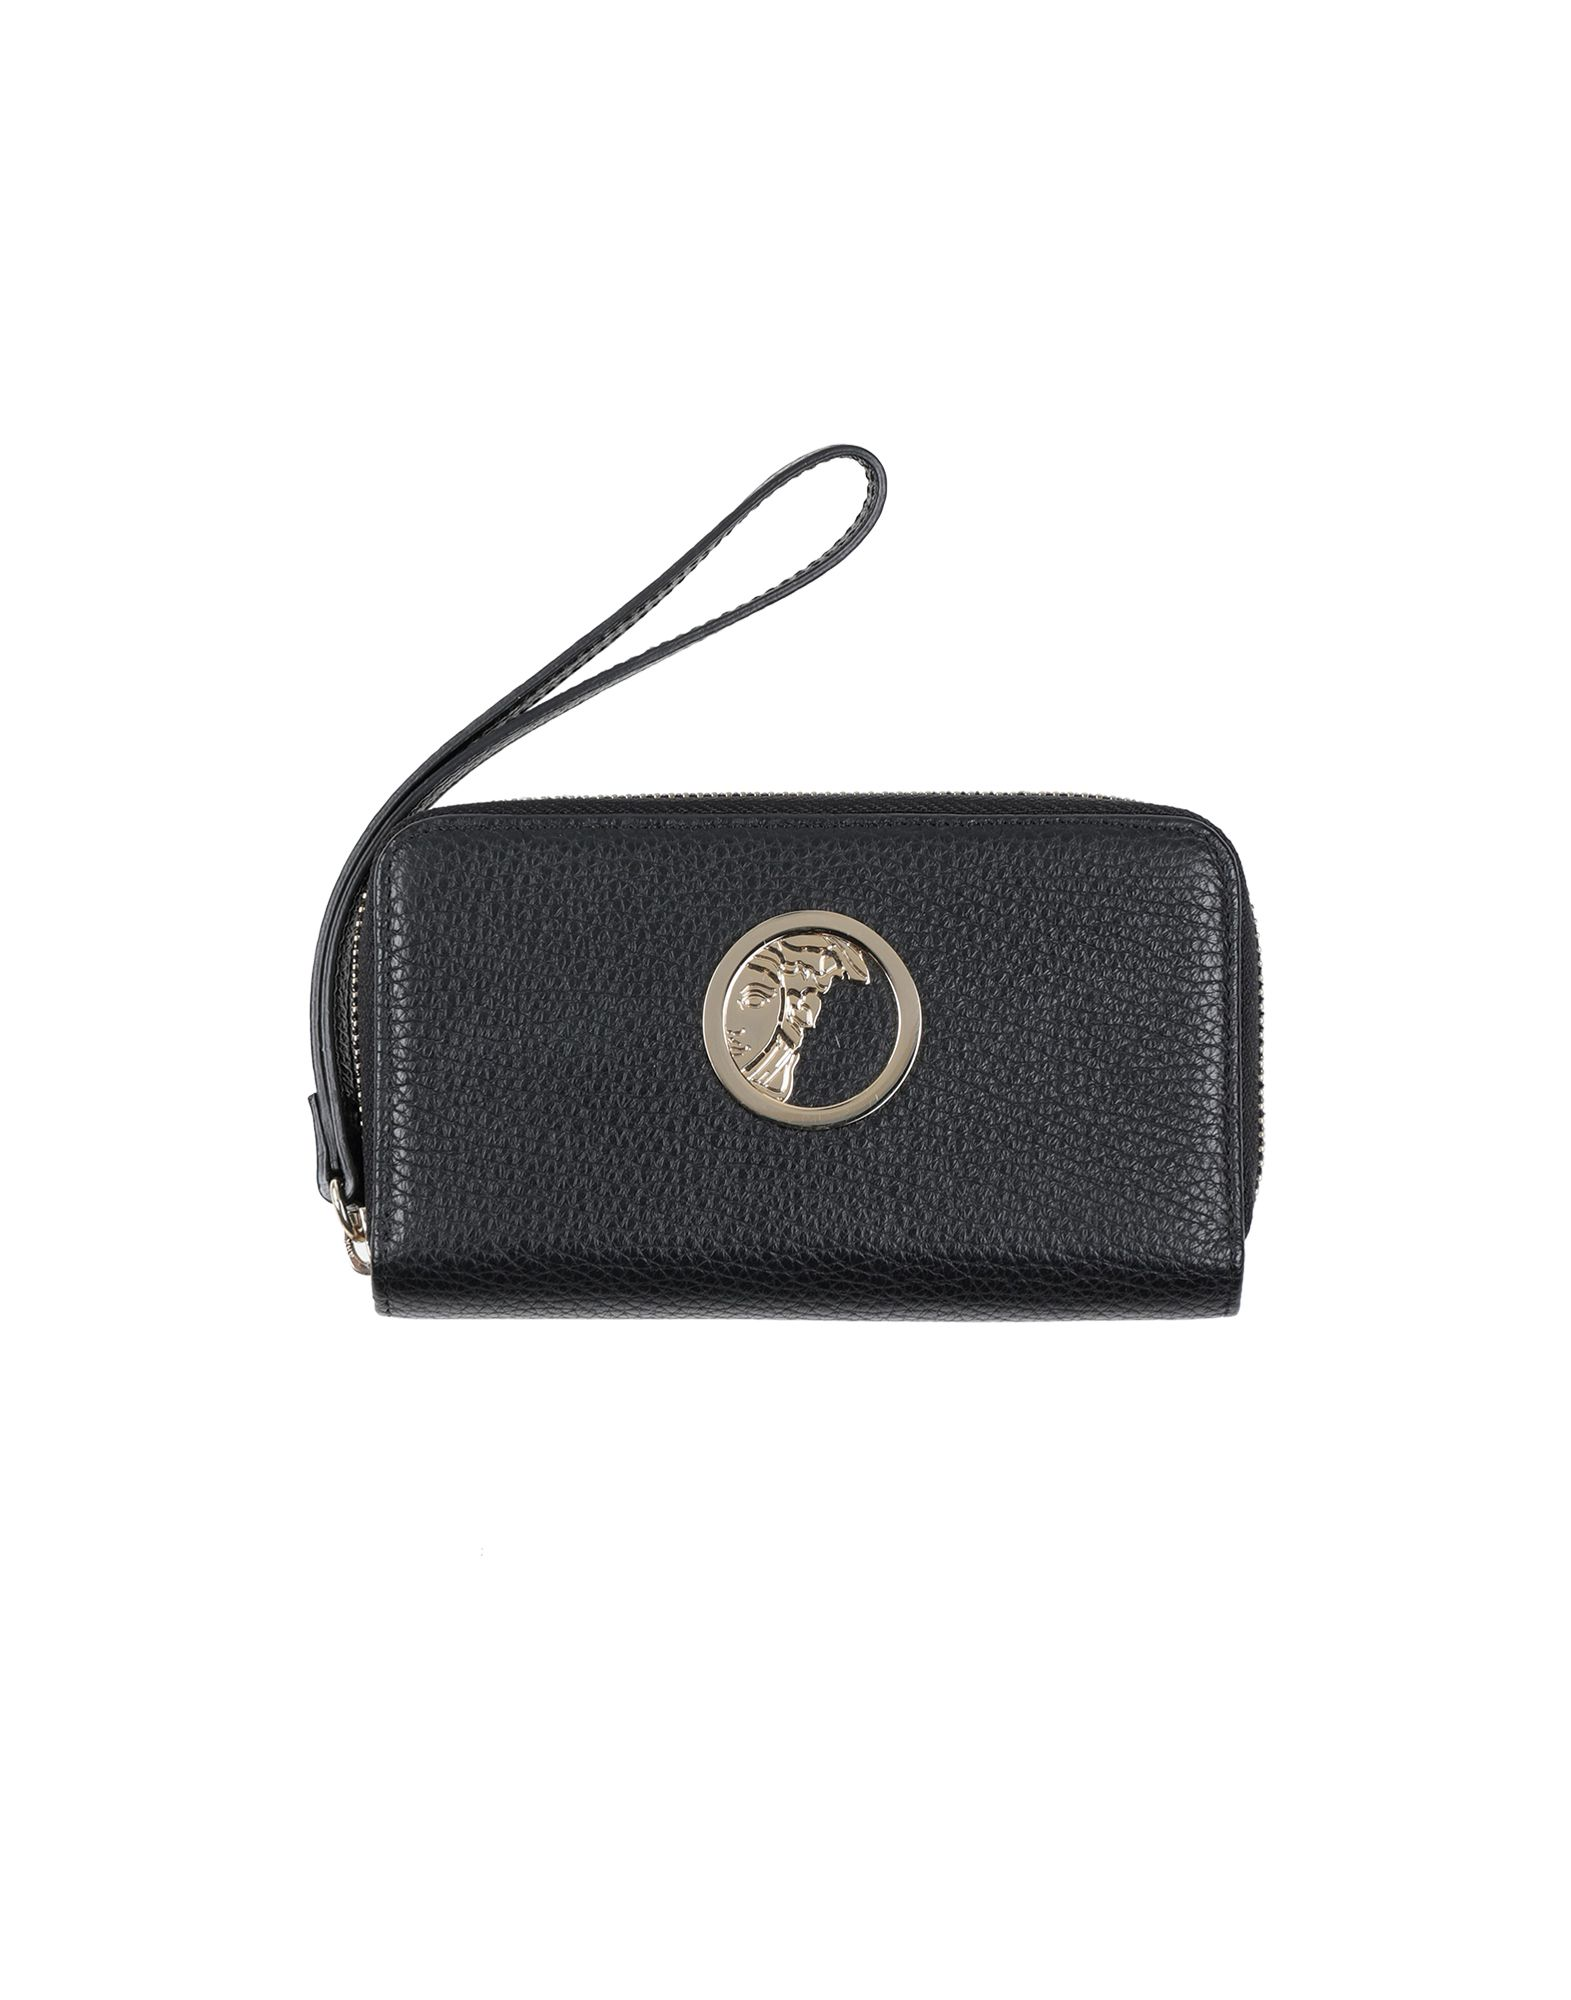 VERSACE COLLECTION Бумажник versace collection аксессуар для техники